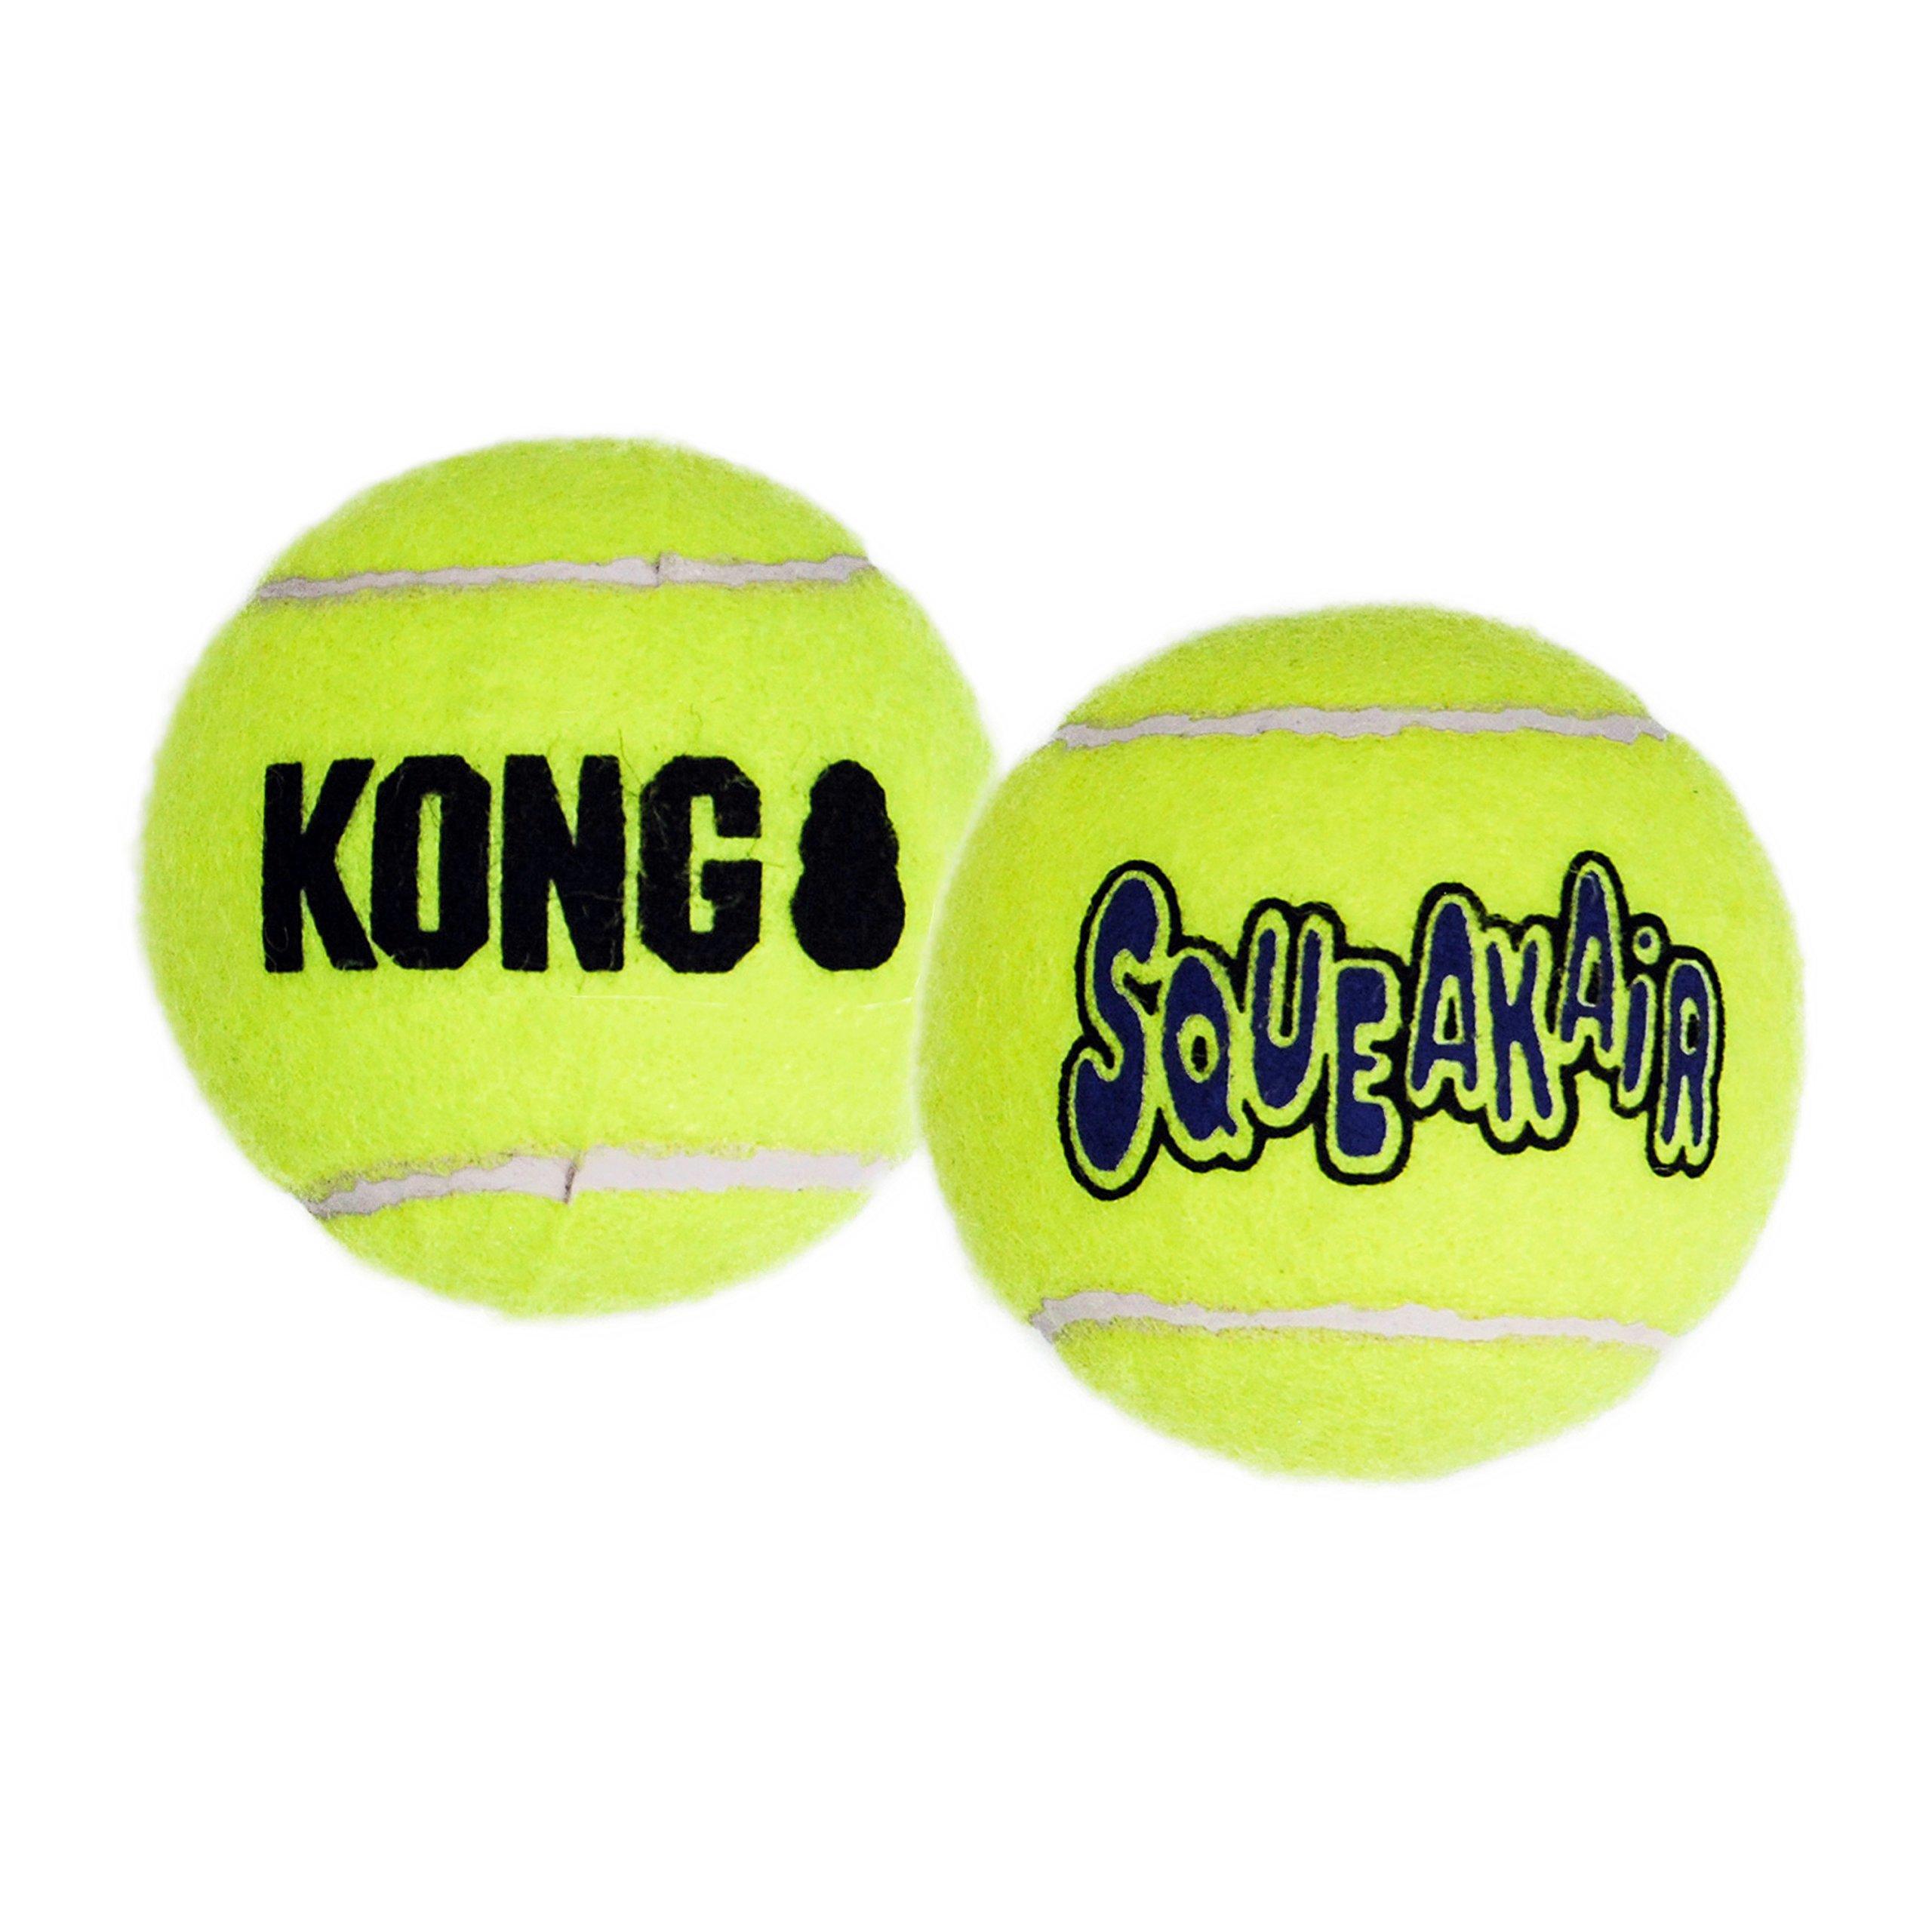 KONG - Squeakair Ball - Dog Toy Premium Squeak Tennis Balls, Gentle on Teeth - for Medium Dogs